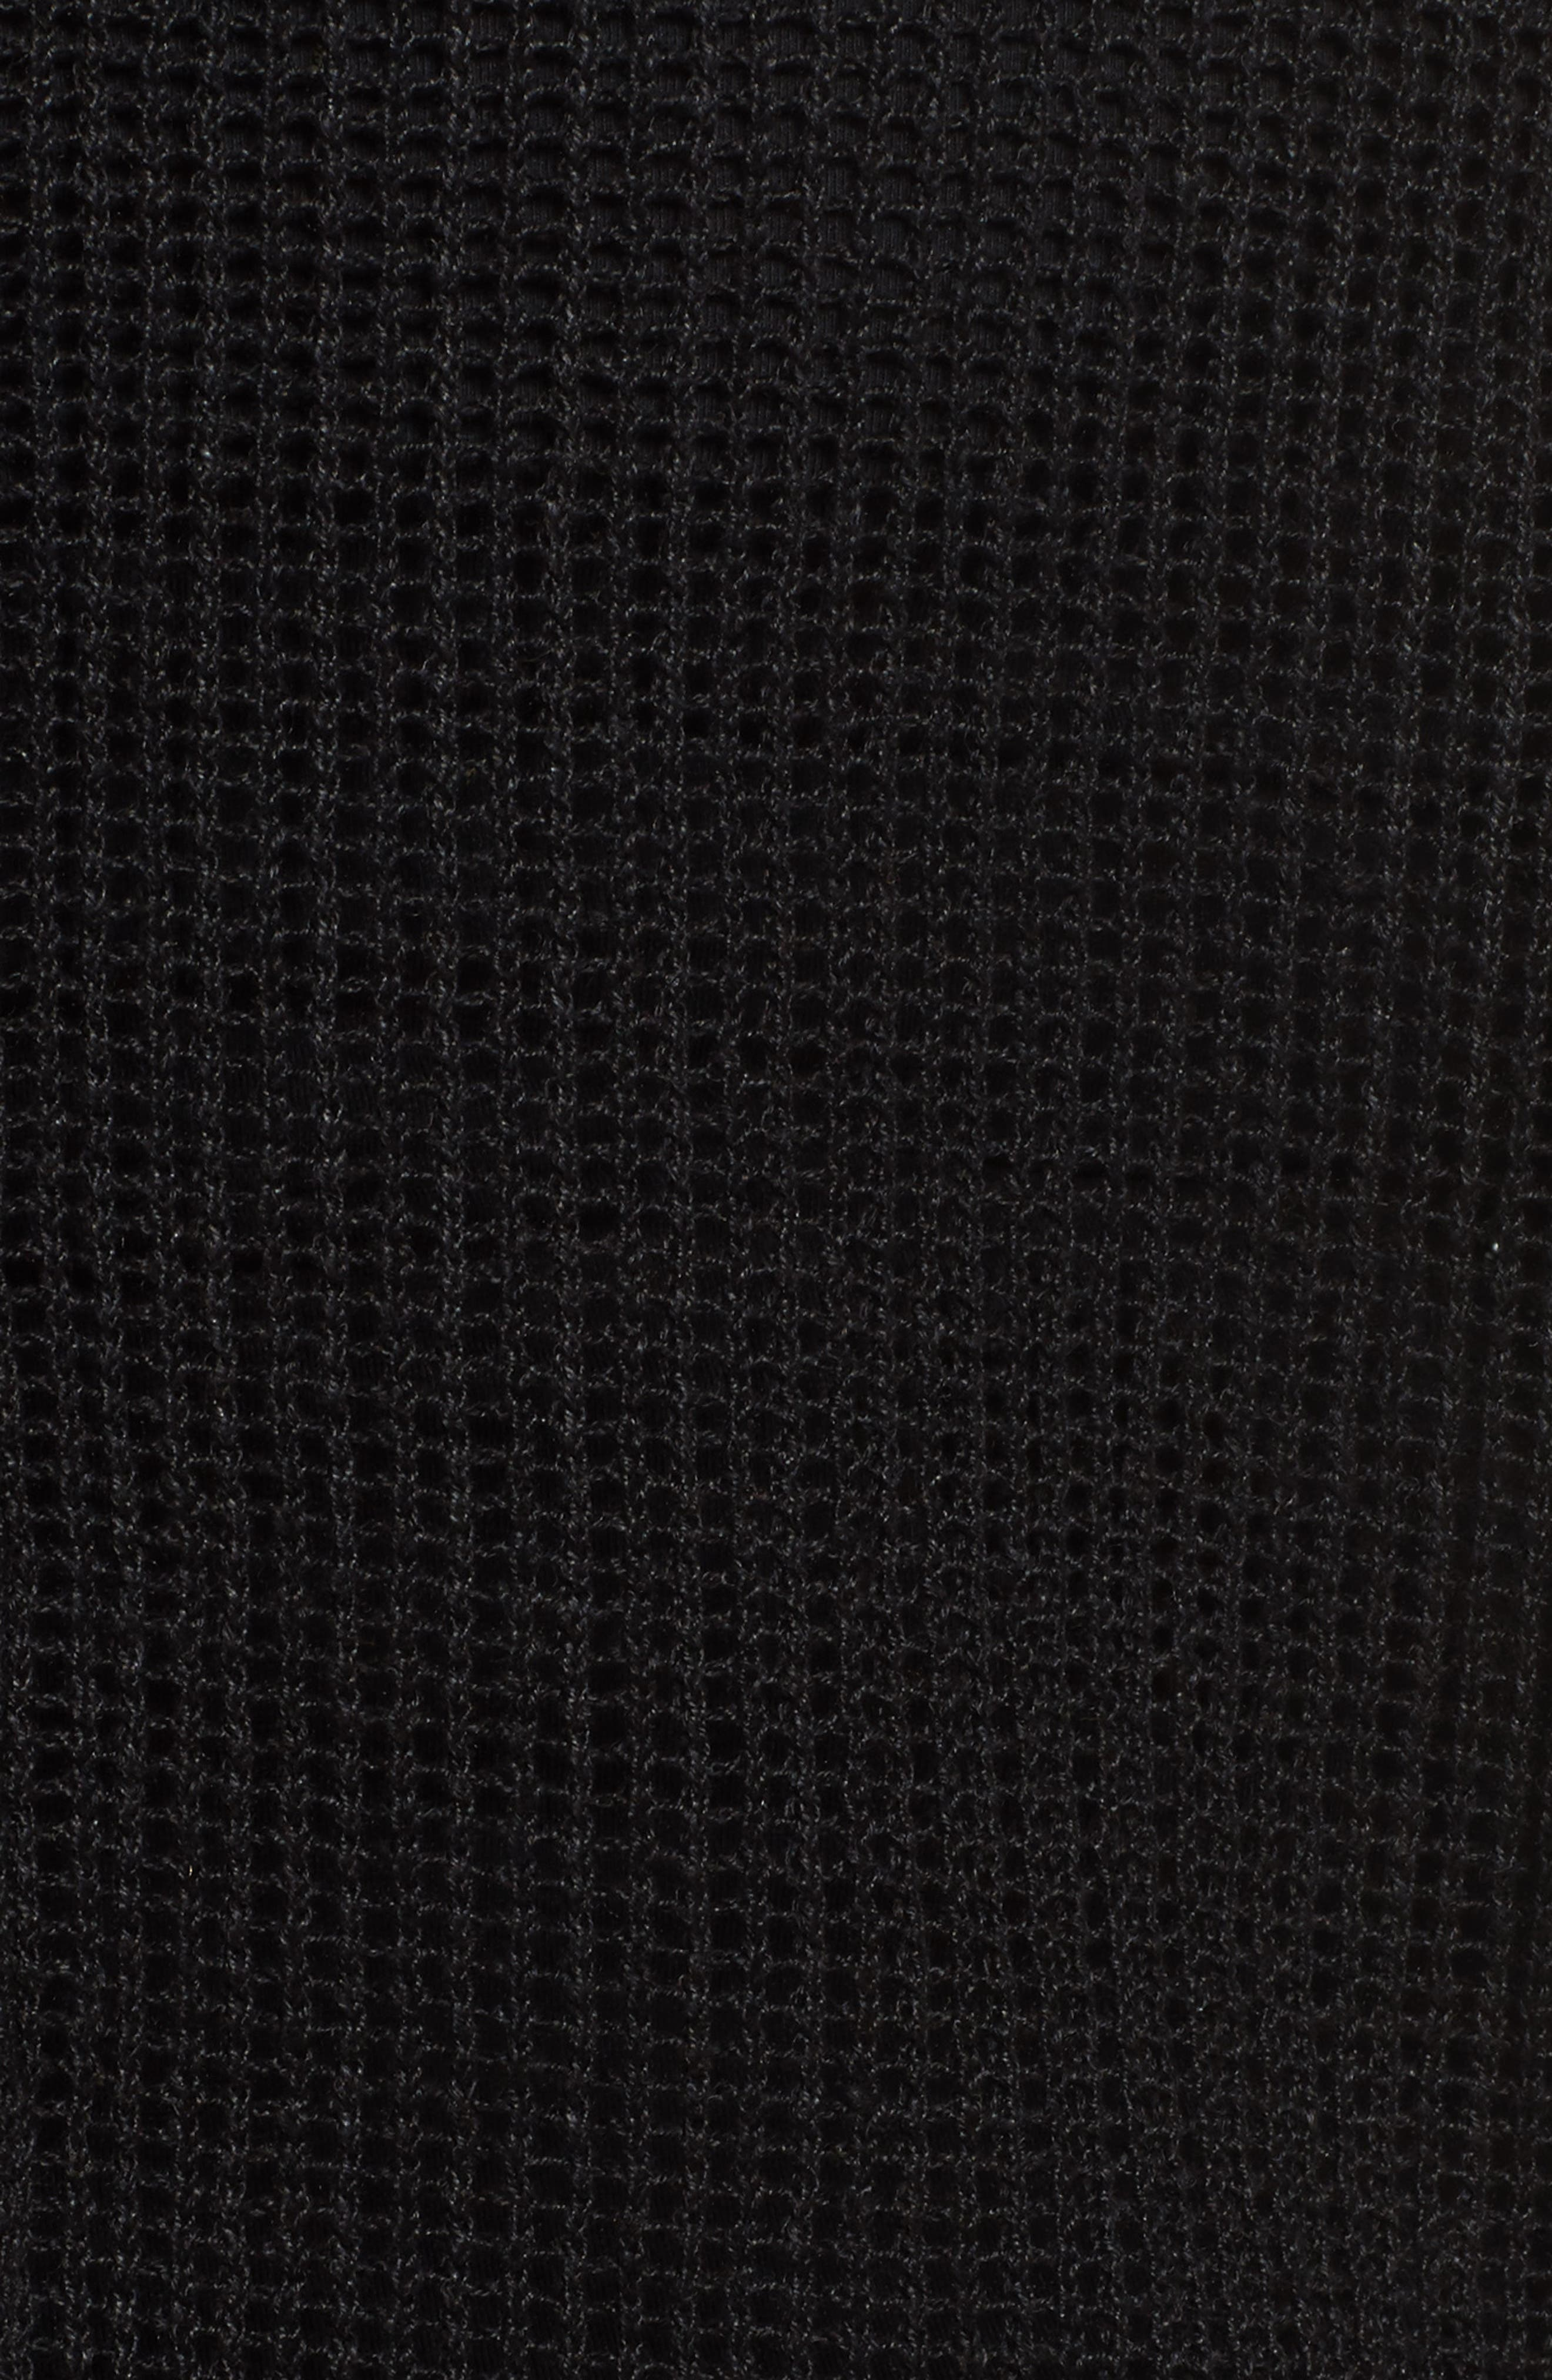 Organic Linen Mesh Knit Top,                             Alternate thumbnail 5, color,                             Black